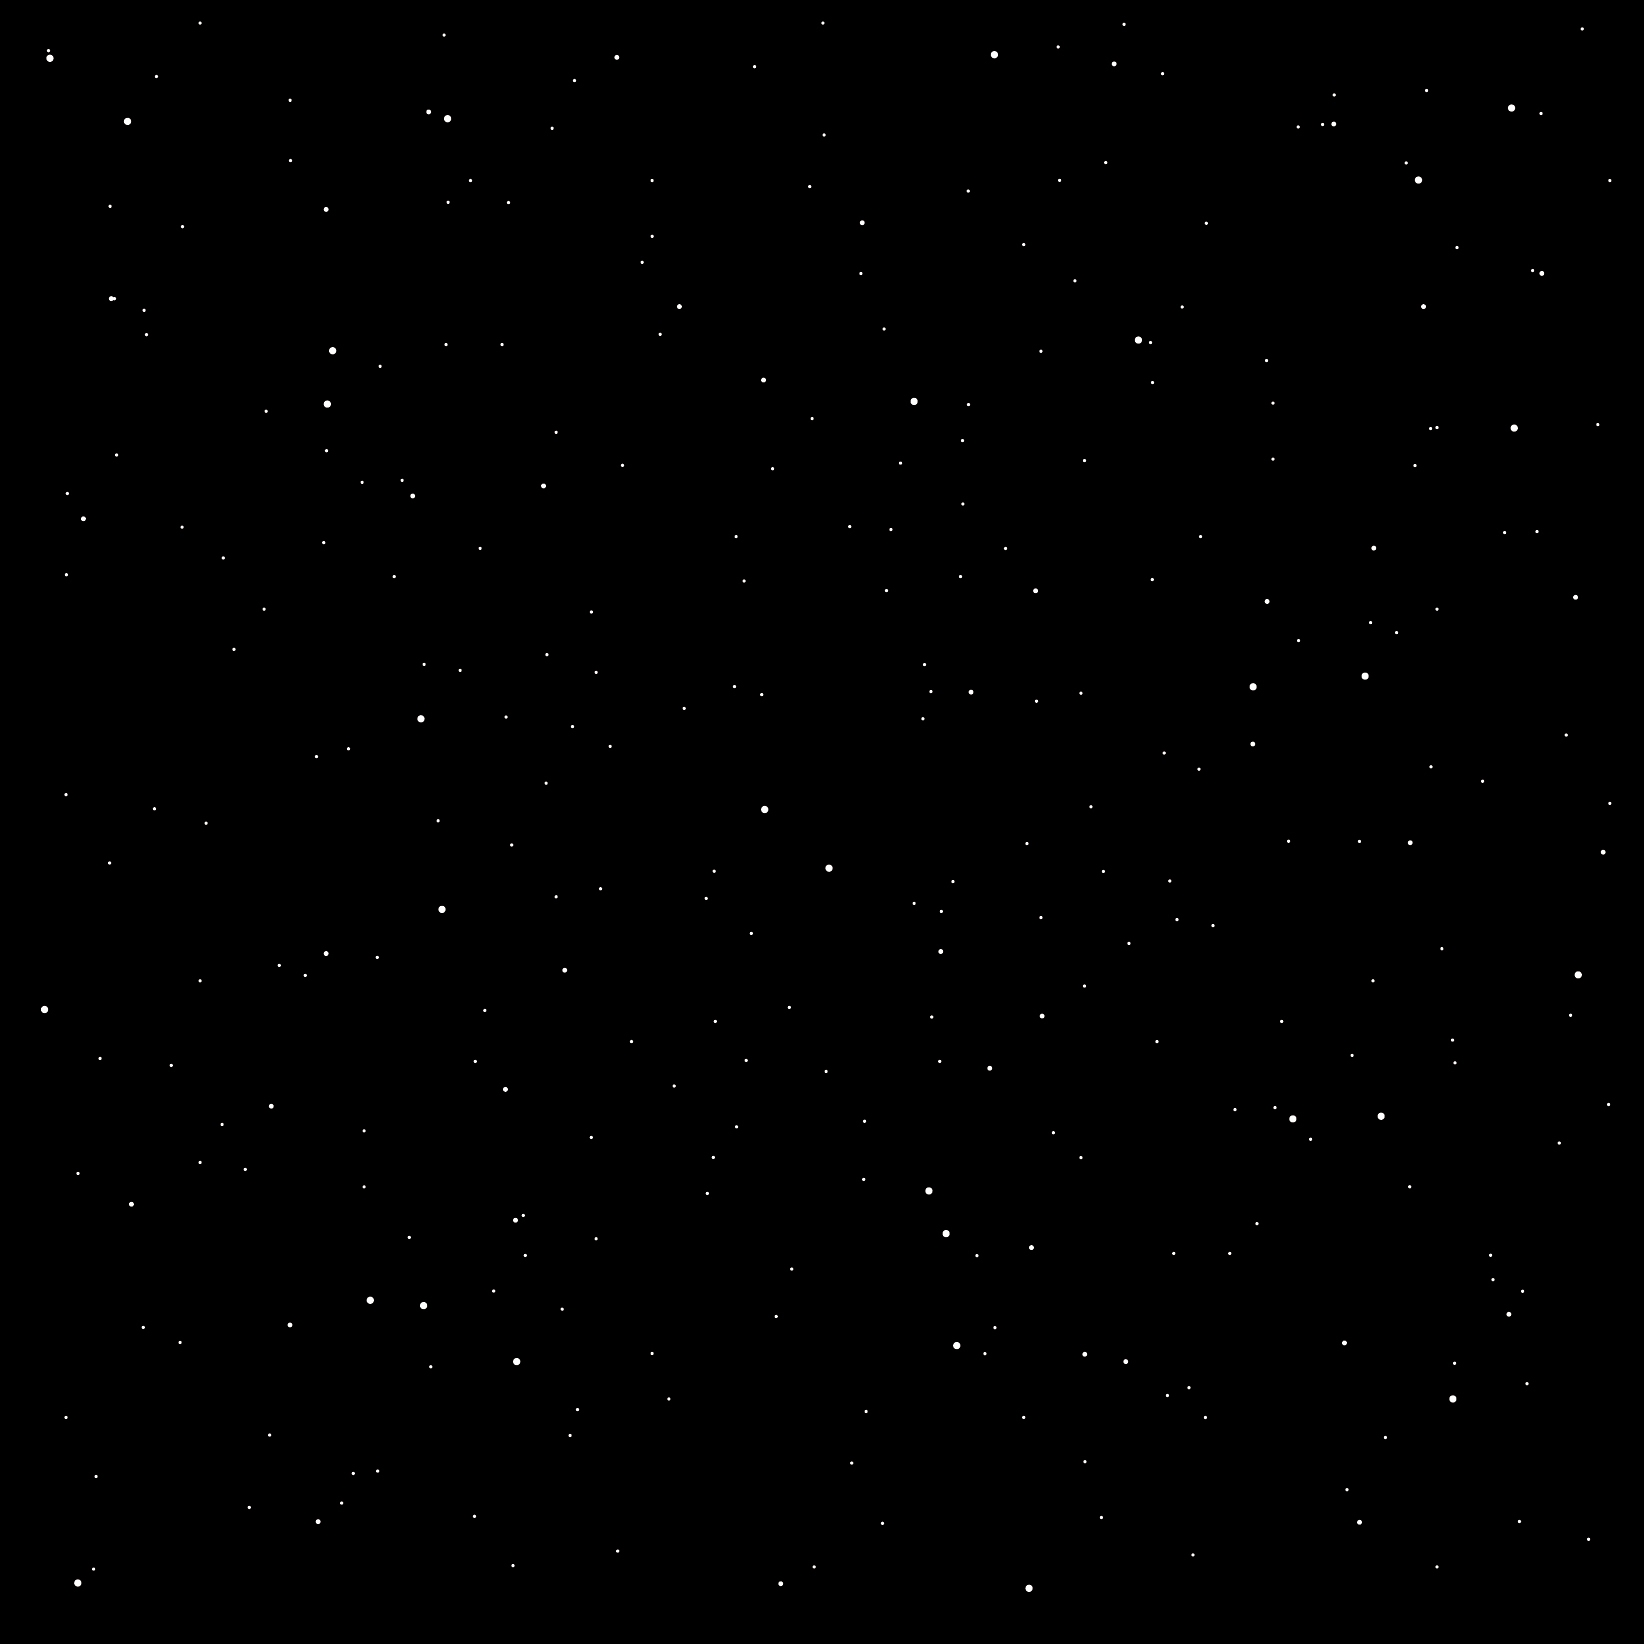 Nightsky2.JPG